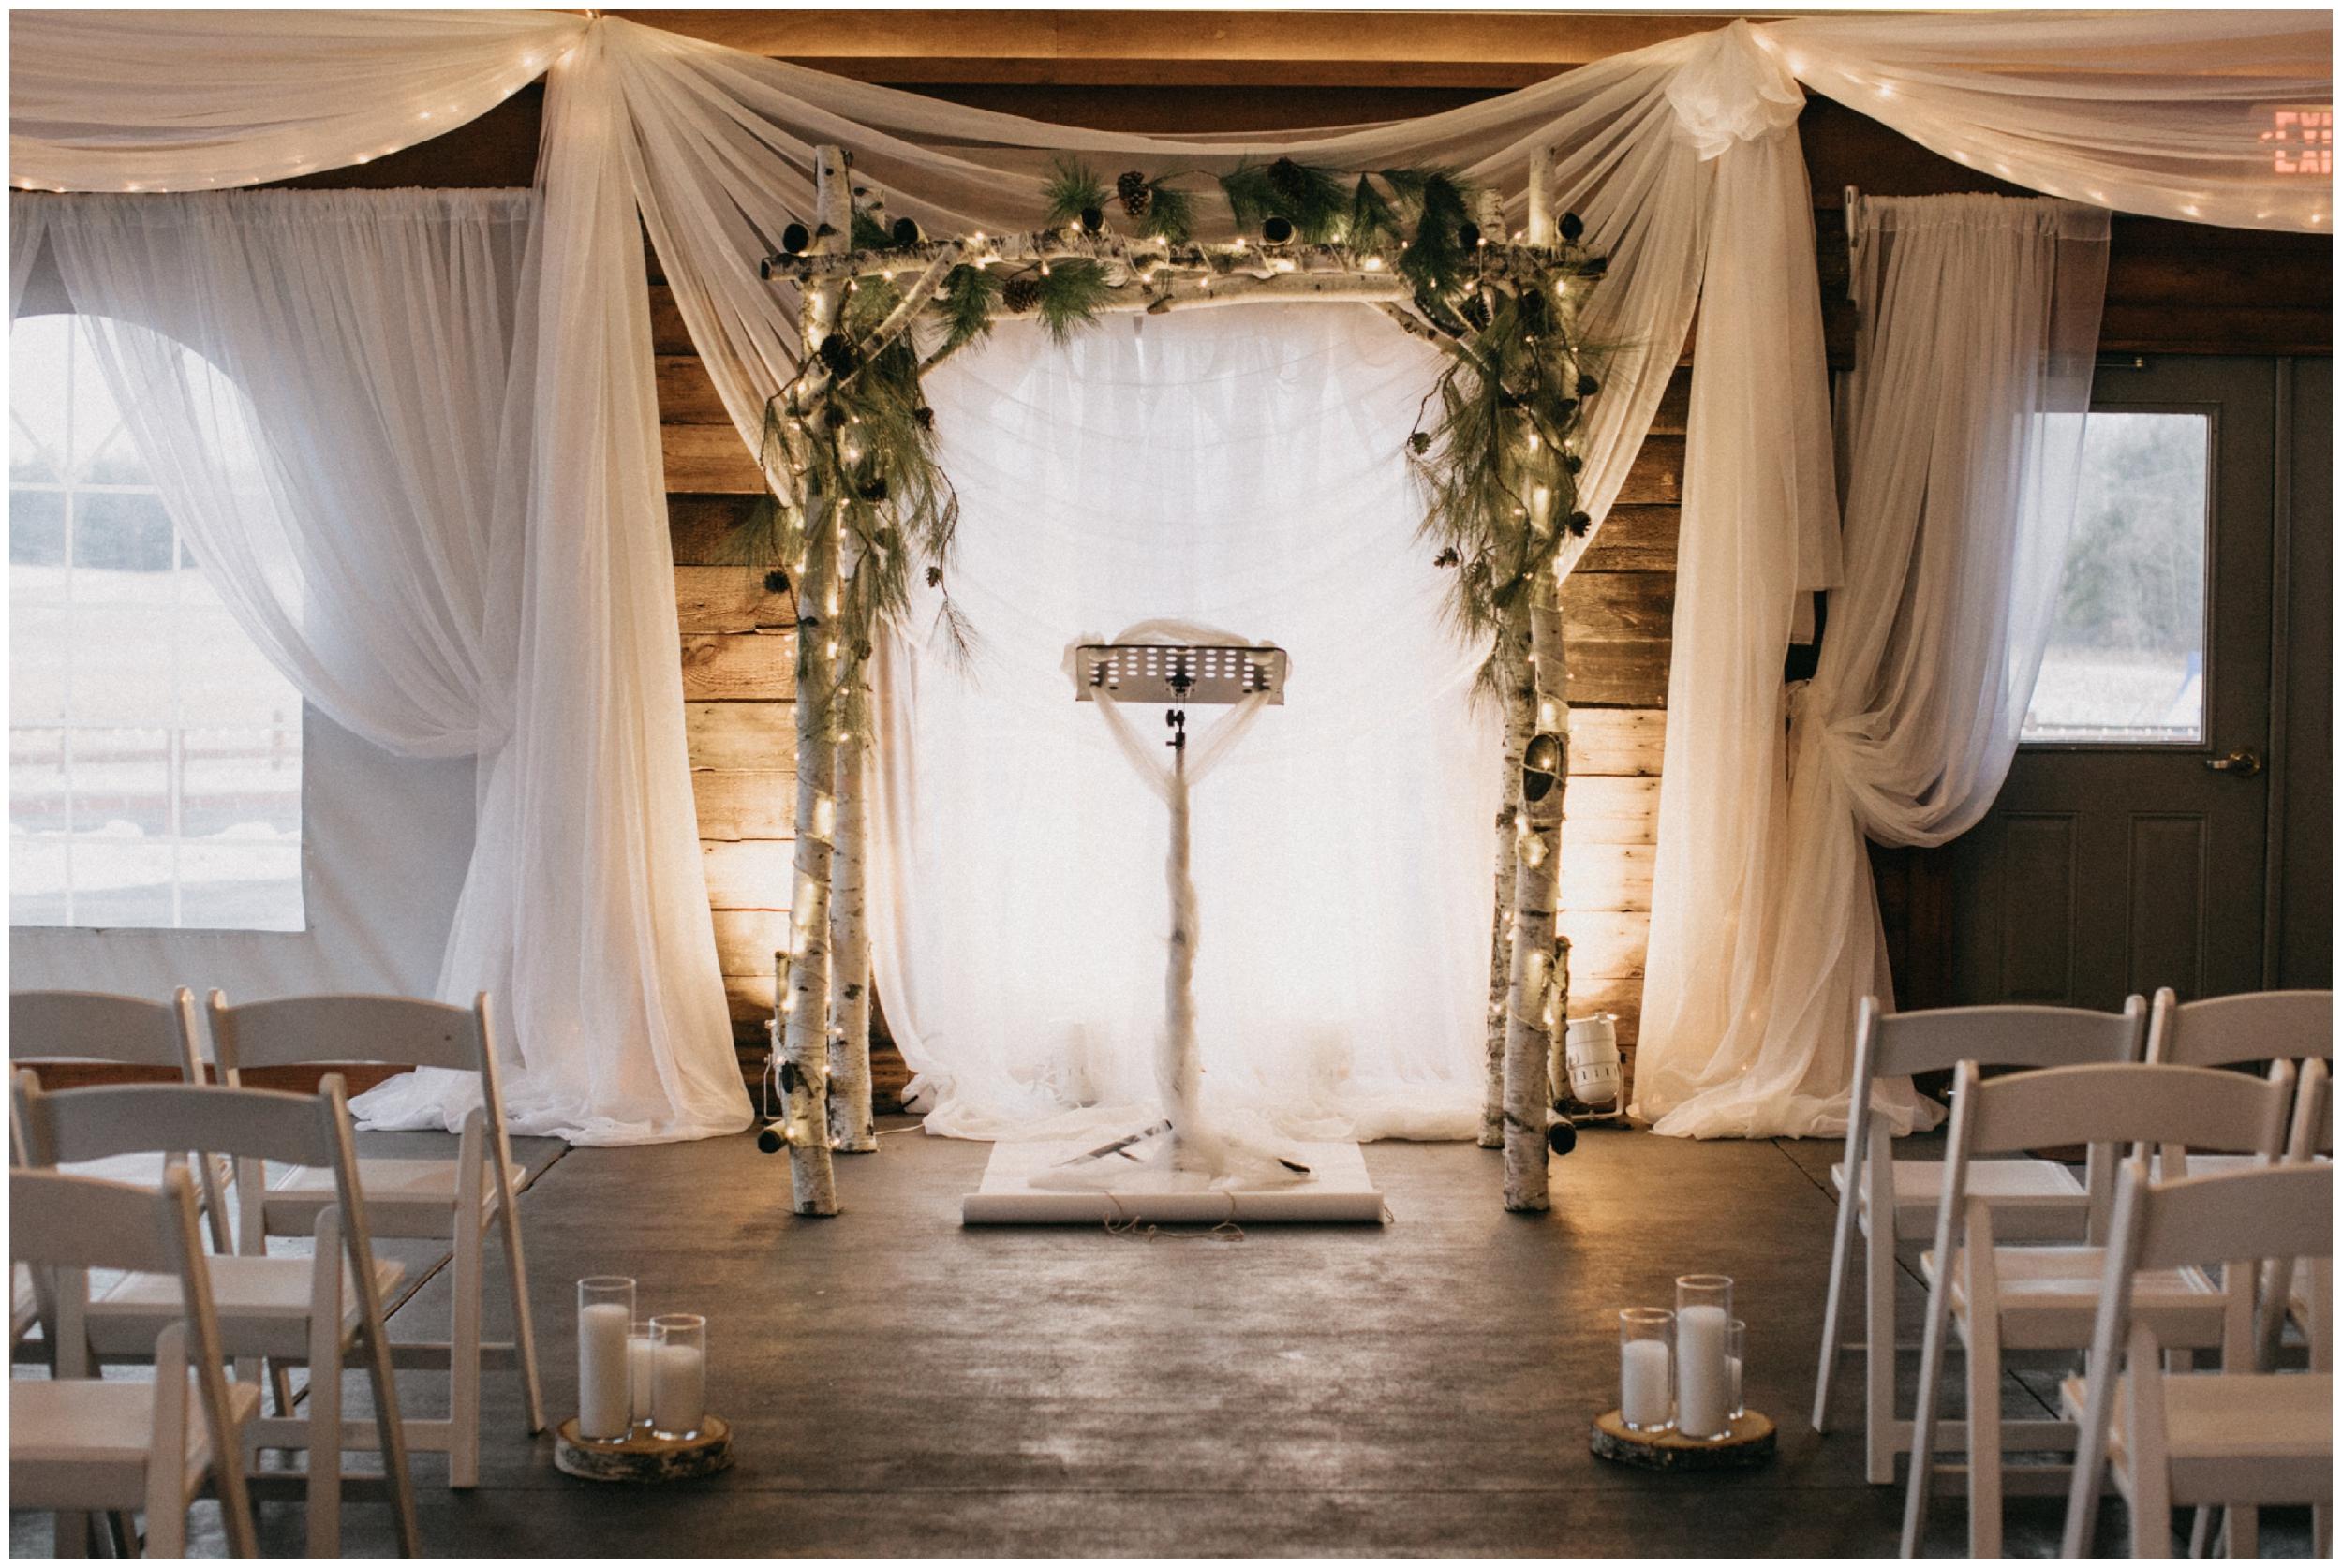 Pine Peaks winter wedding ceremony in Crosslake MN